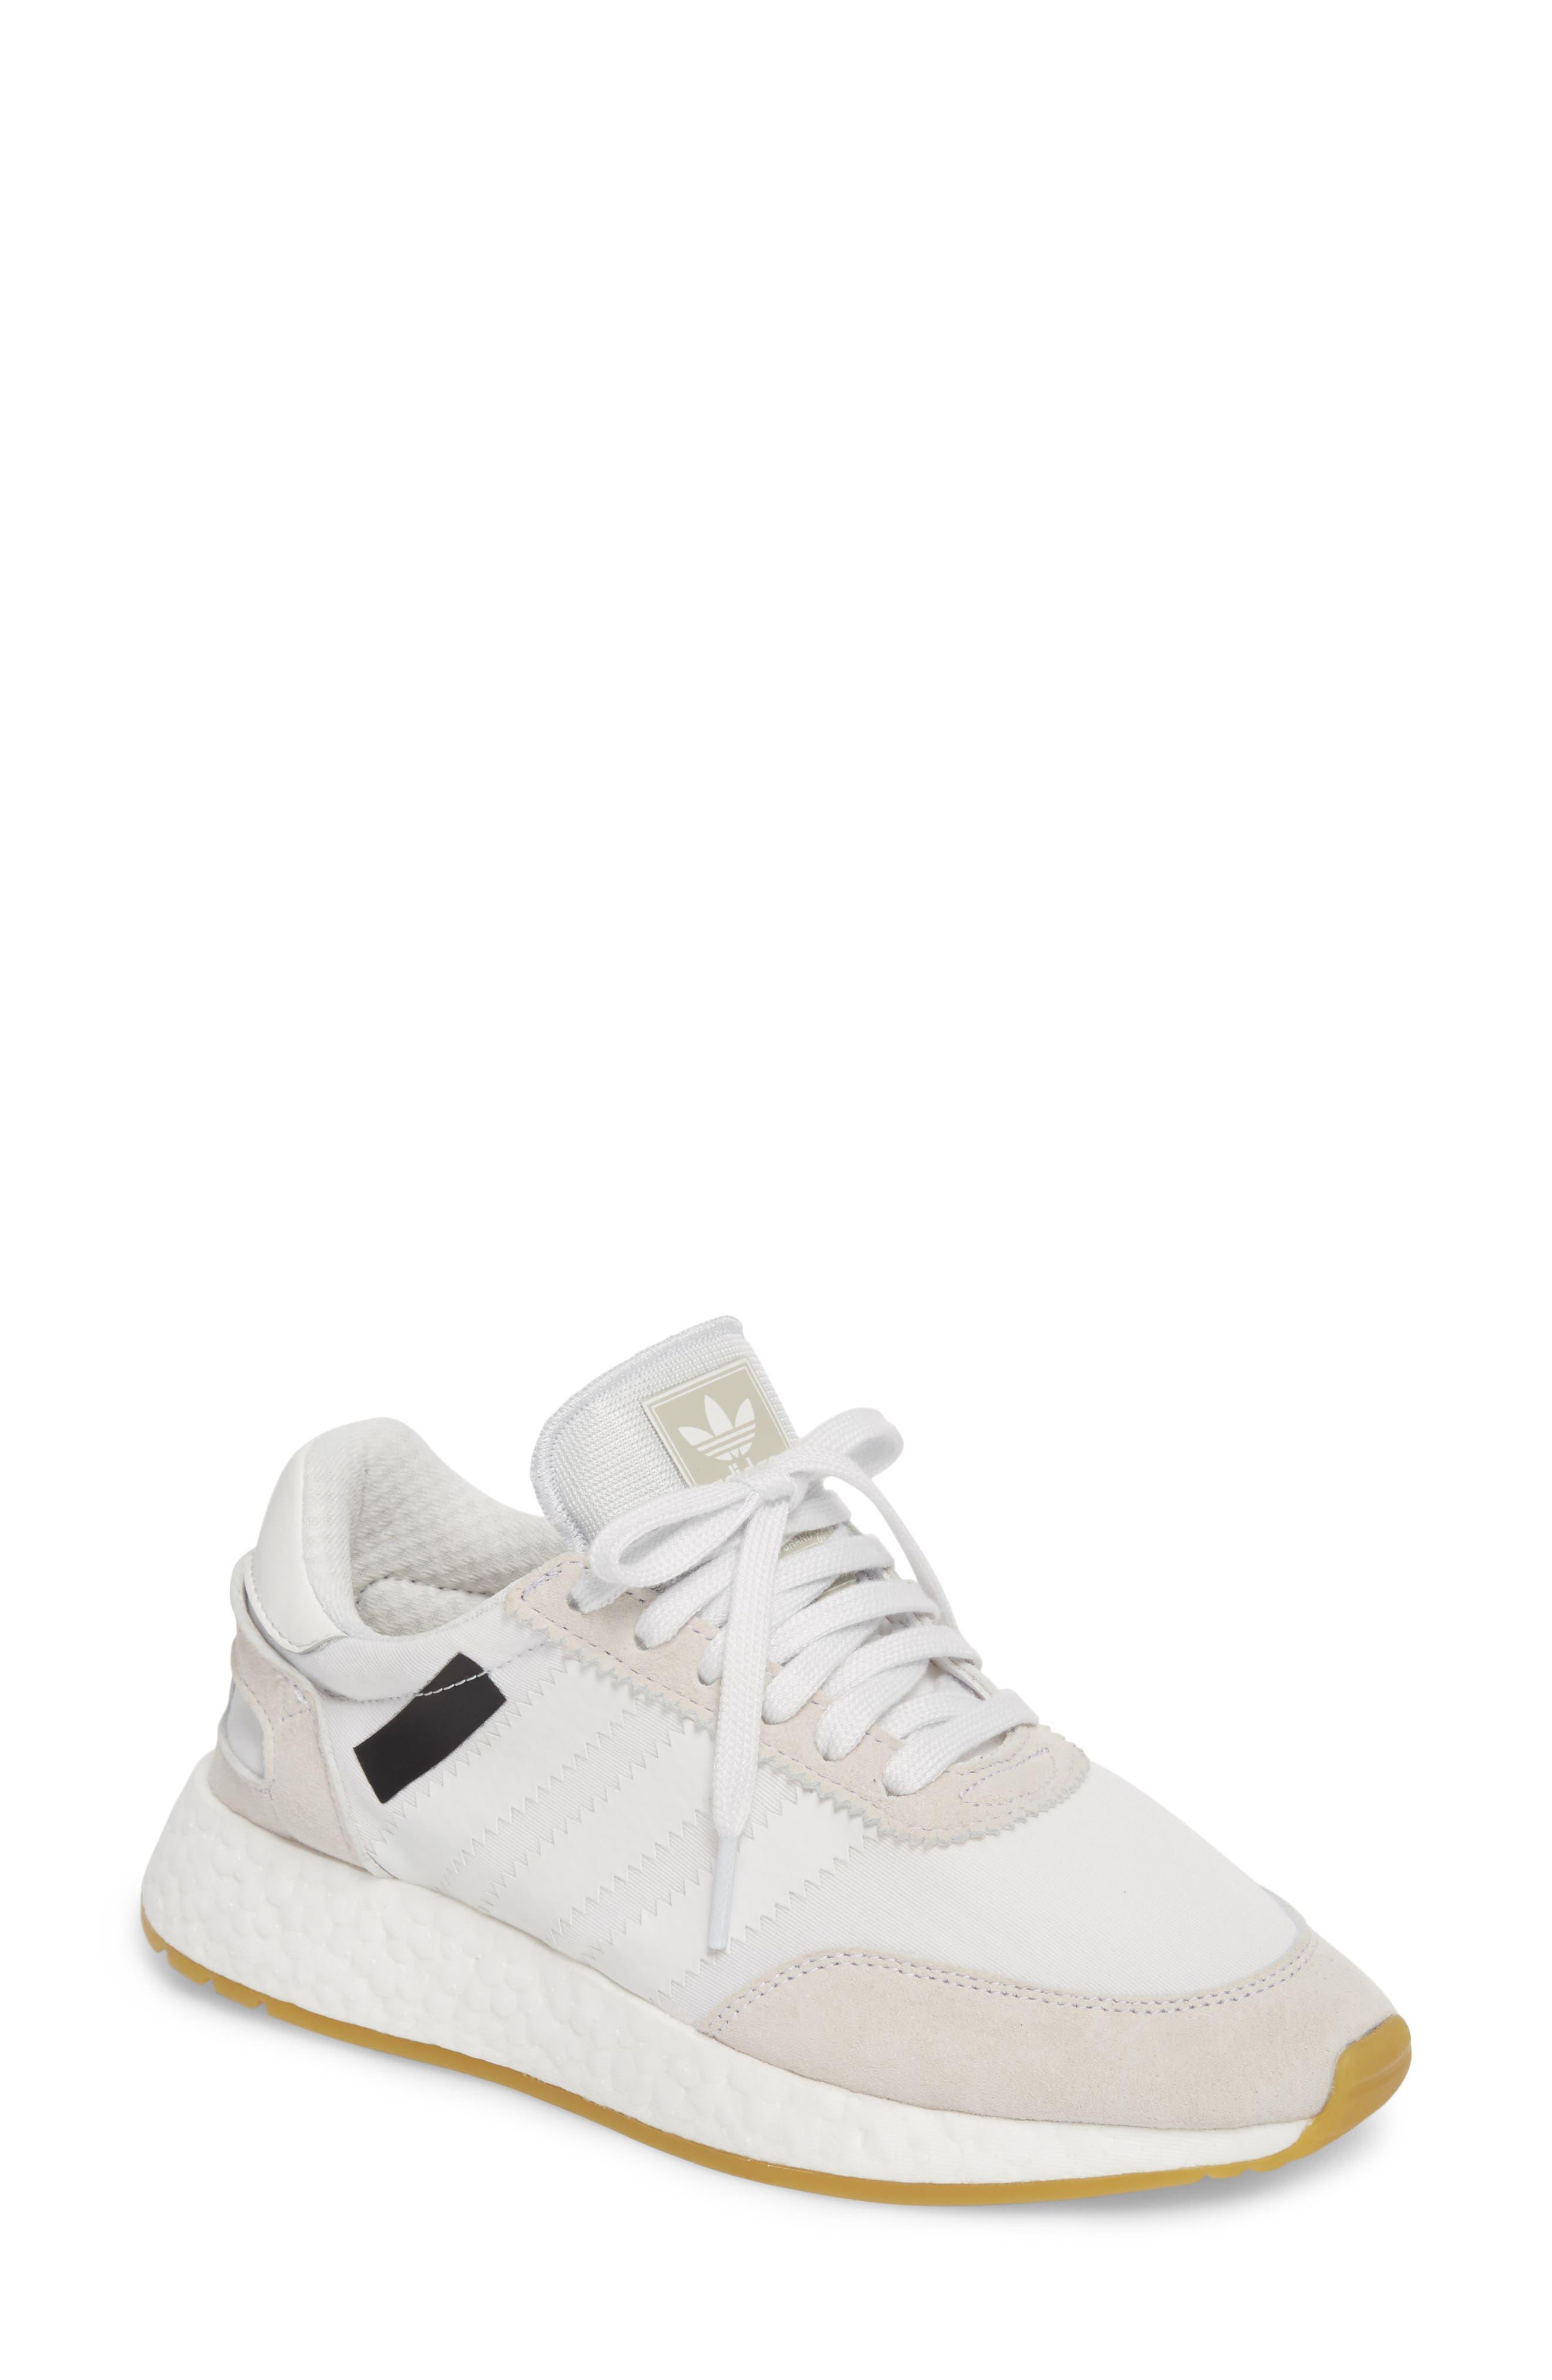 Alternate Image 1 Selected - adidas I-5923 Sneaker (Women)